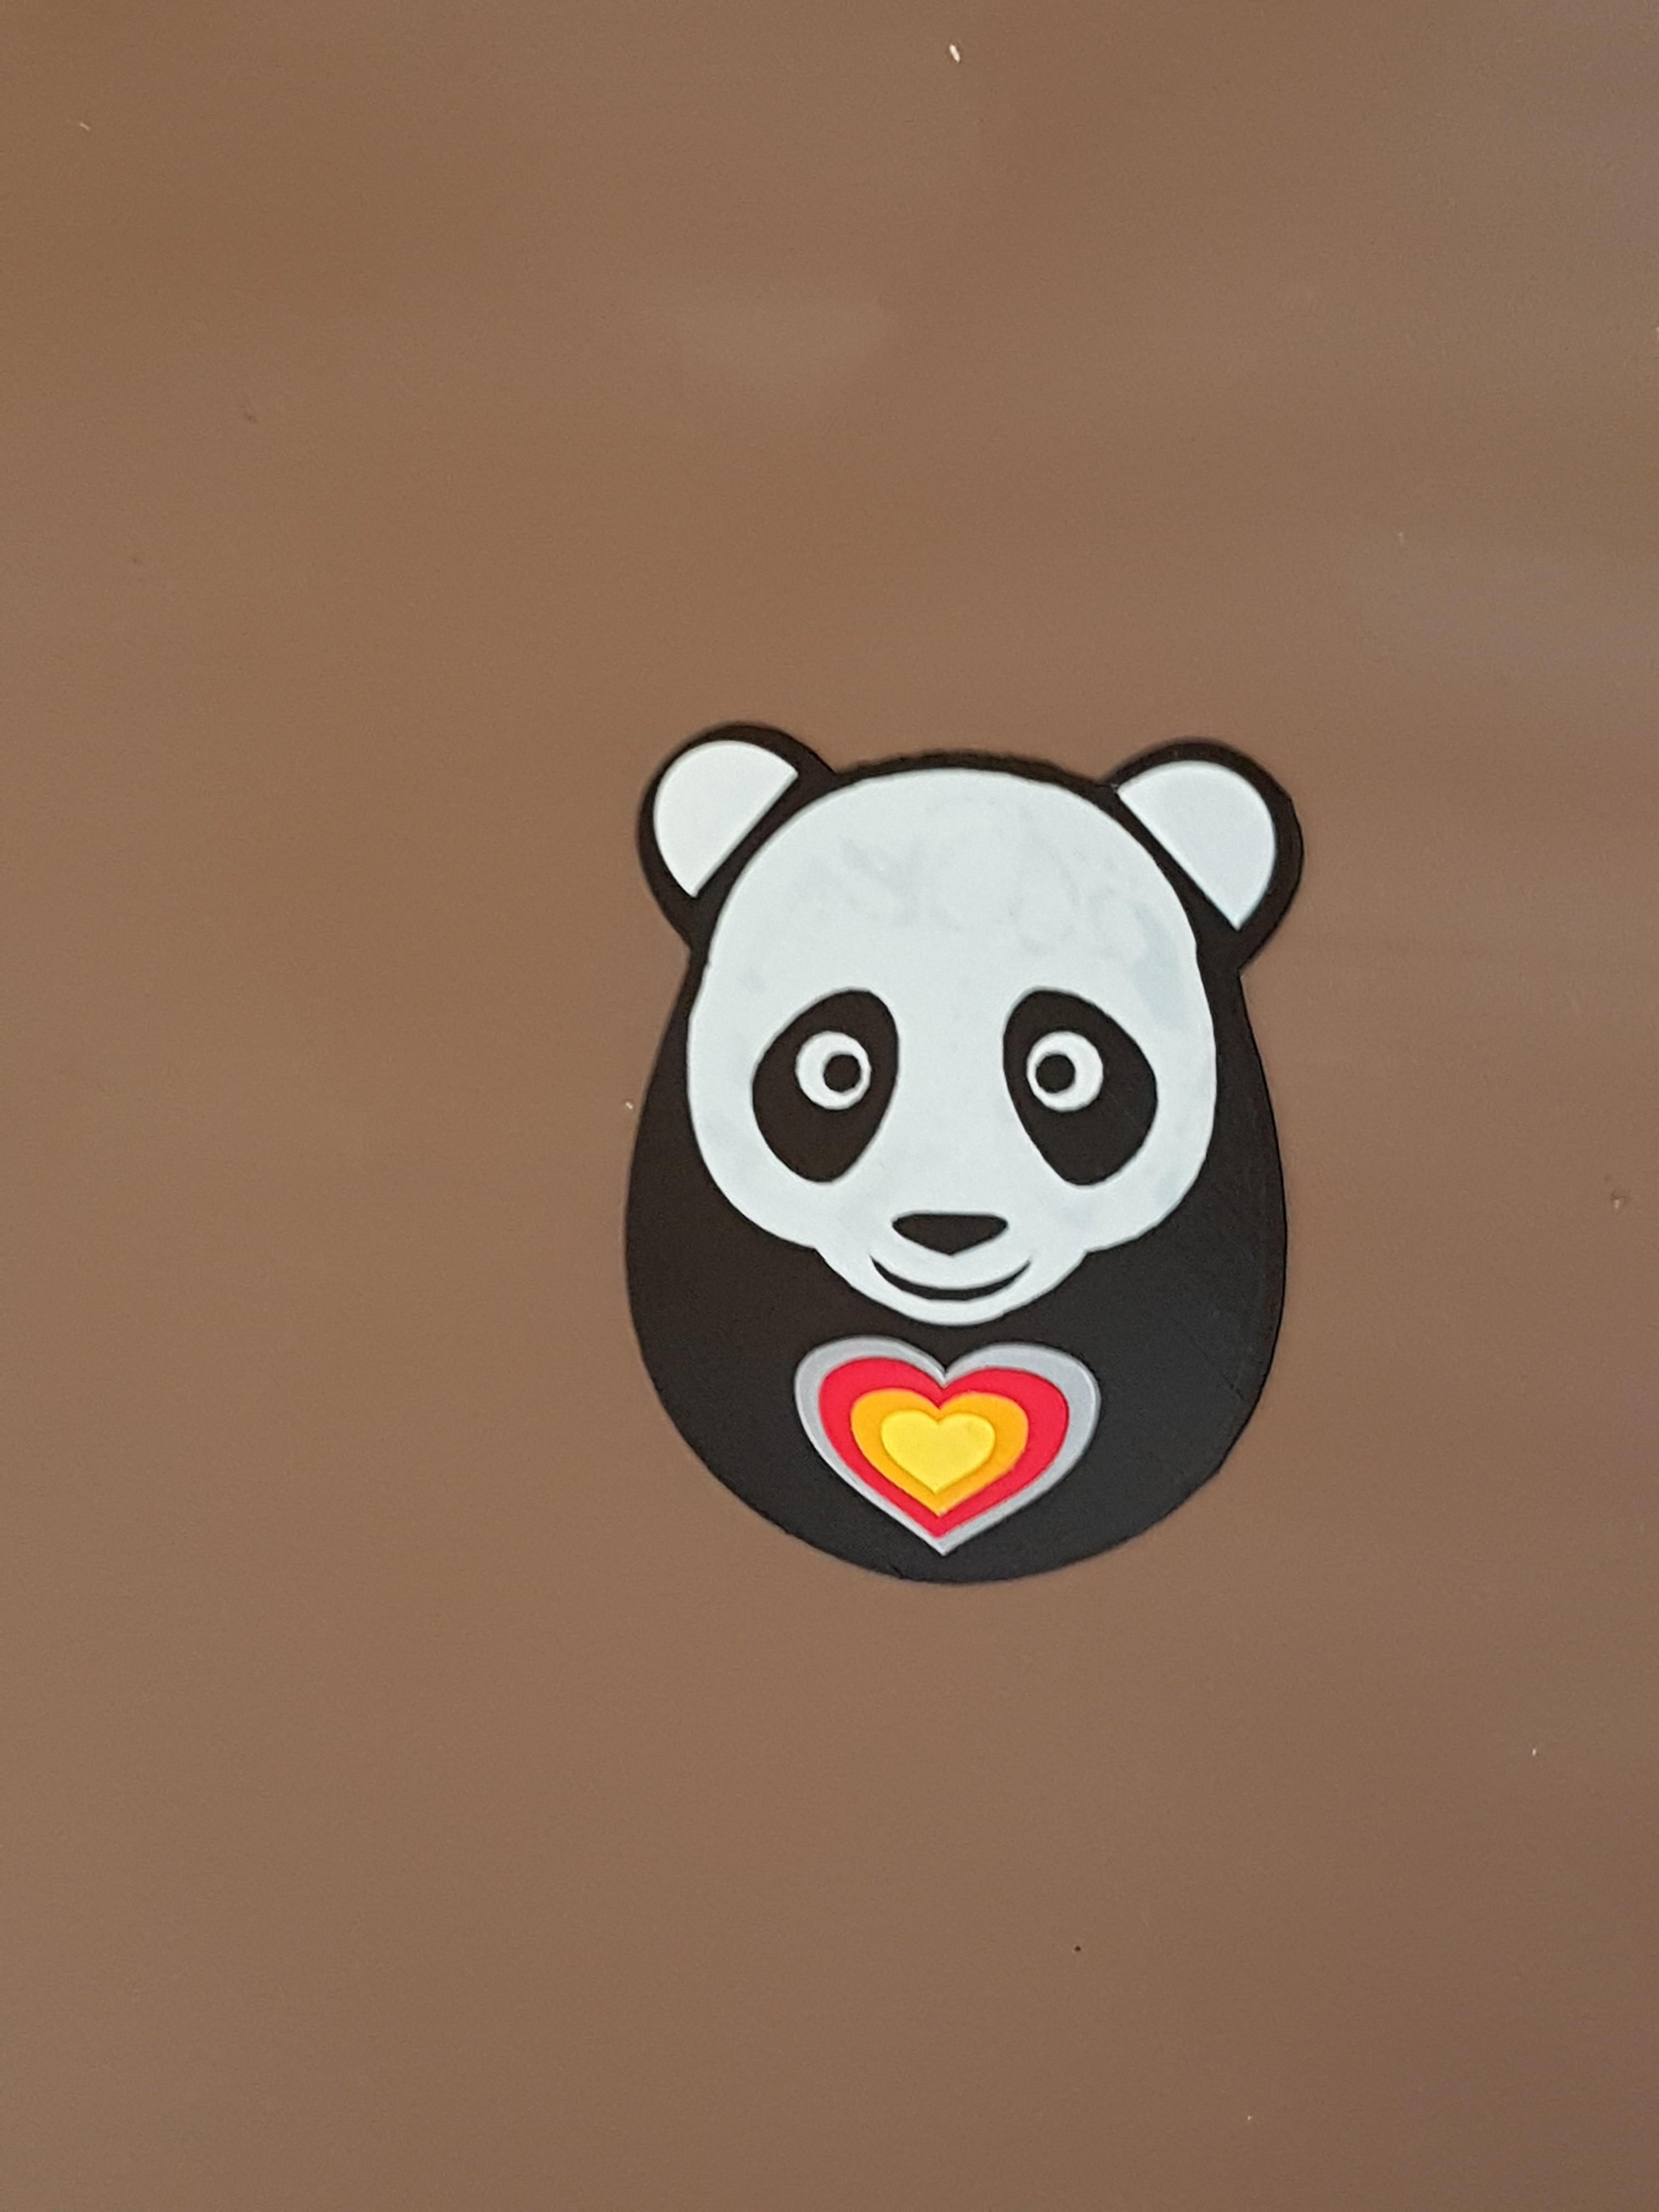 20170804_101234.jpg Download STL file panda hearts decoration • 3D printer template, catf3d